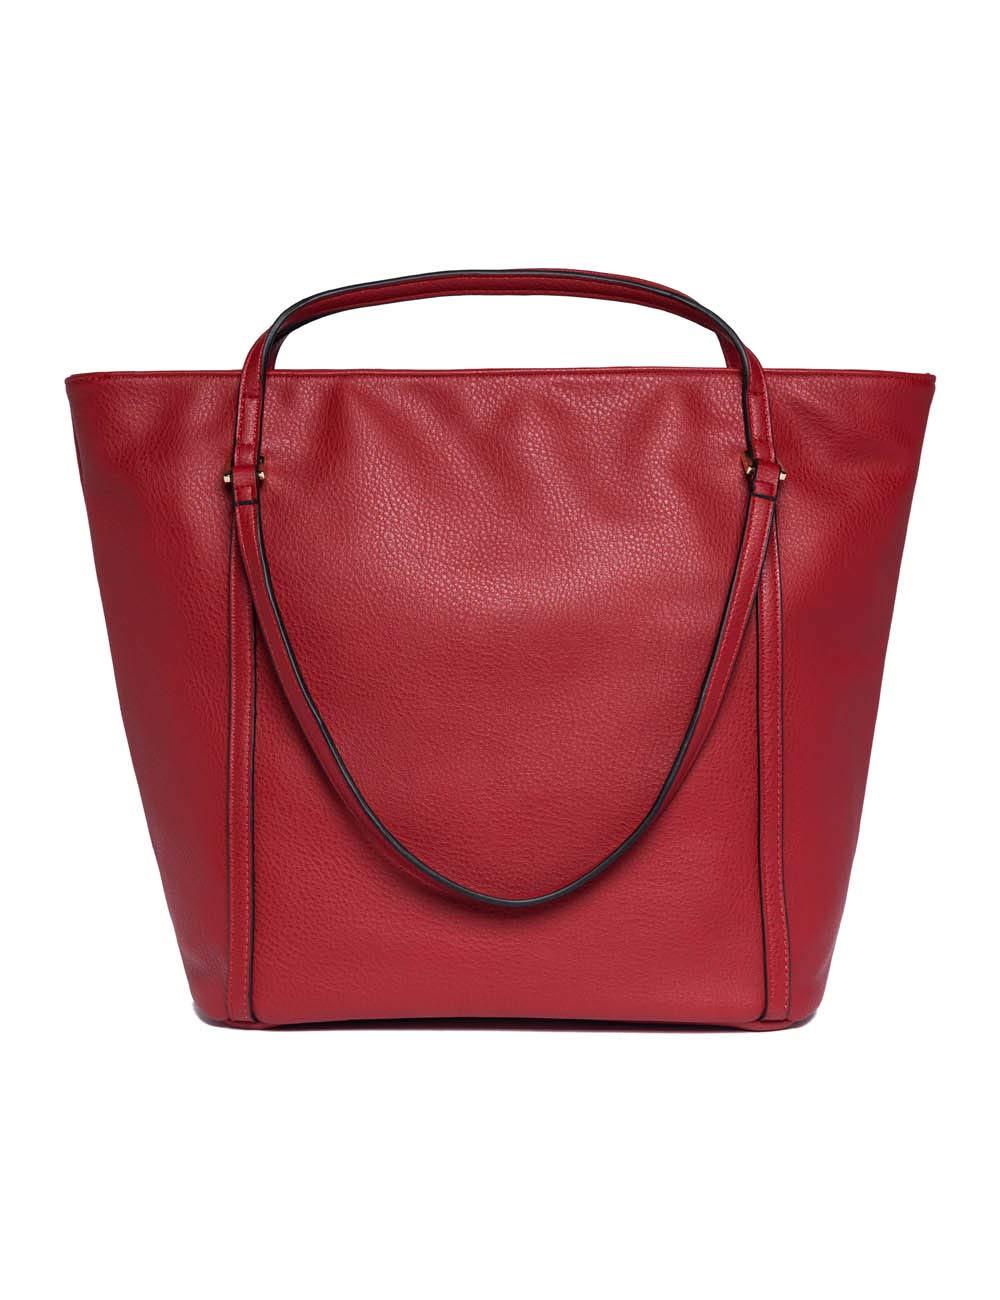 Replay dam Fw3836.000.a0132d handväska, 18 x 33,5 x 30,5 cm Röd (glansig röd)